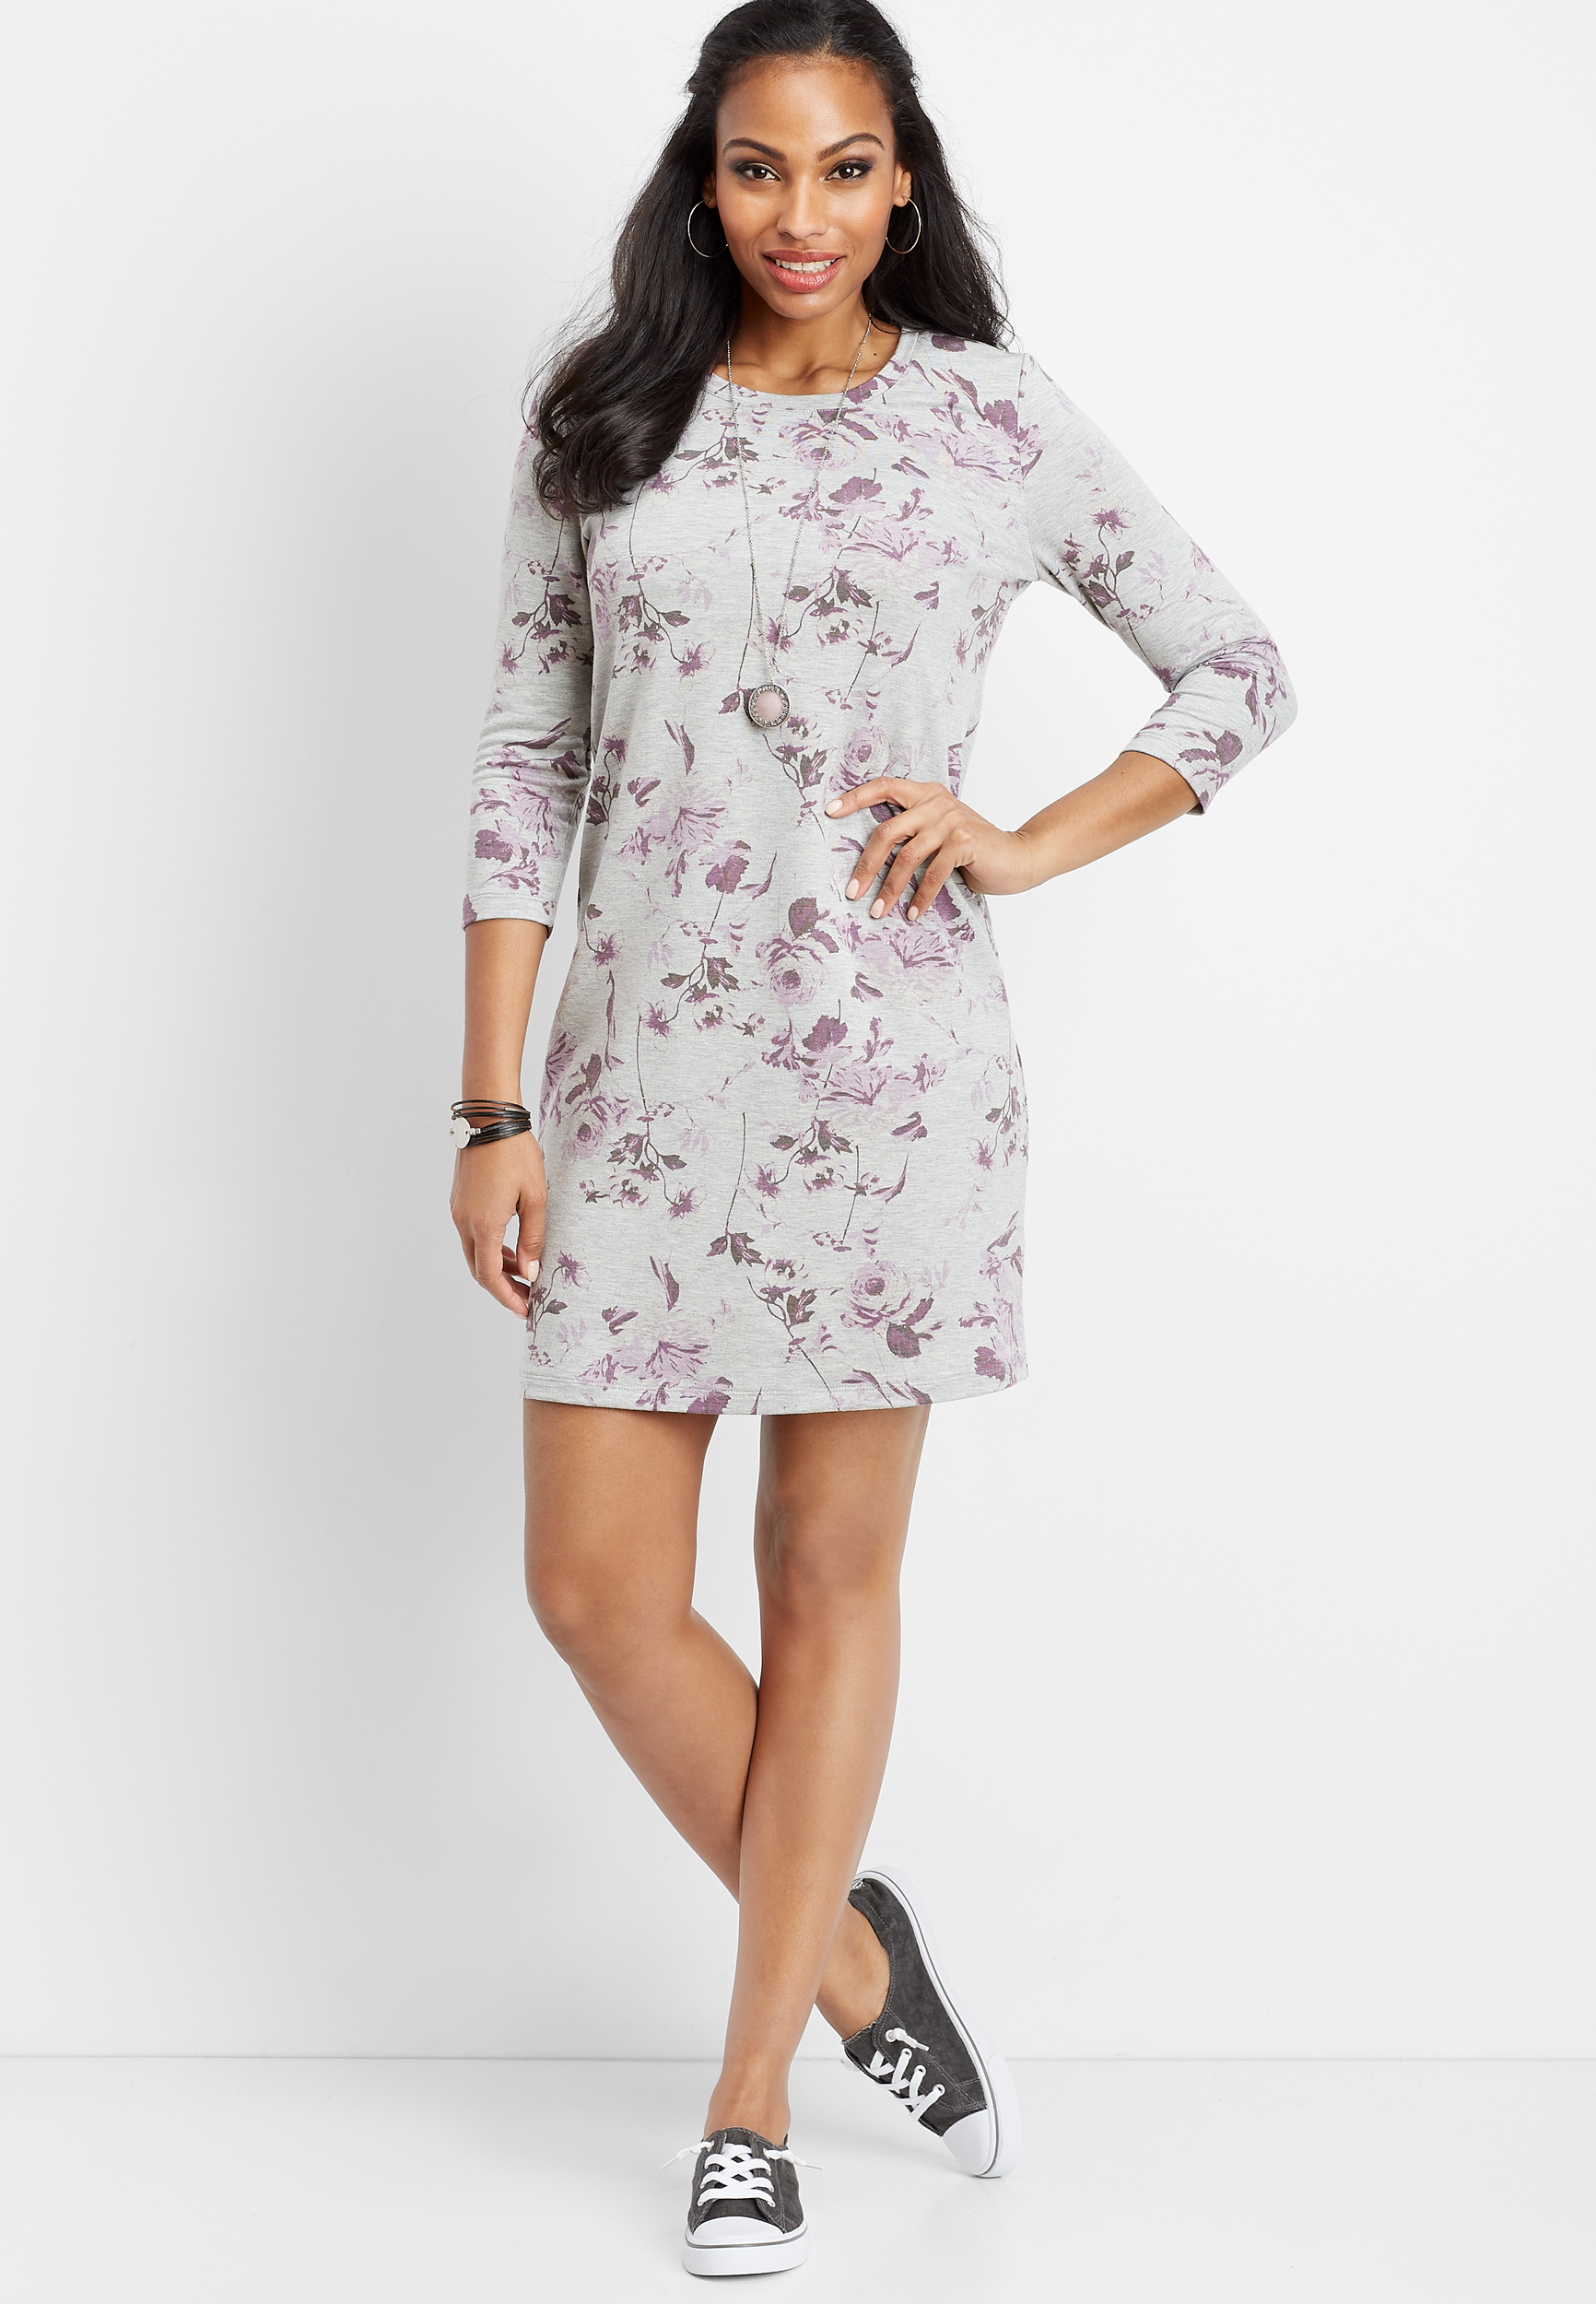 Small Grey Dress